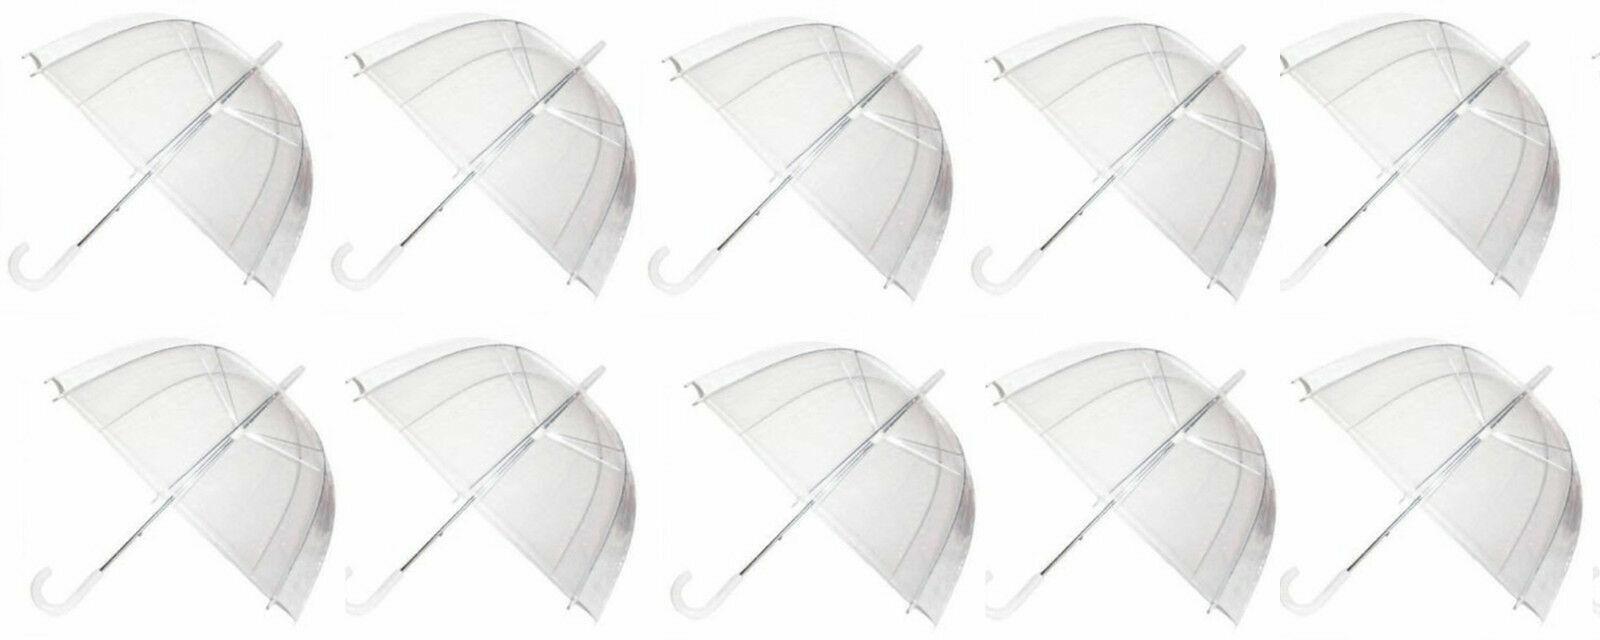 10x Set Rain Umbrellas Dome Birdcage Transparent PVC Wedding Brolly Clear Bubble